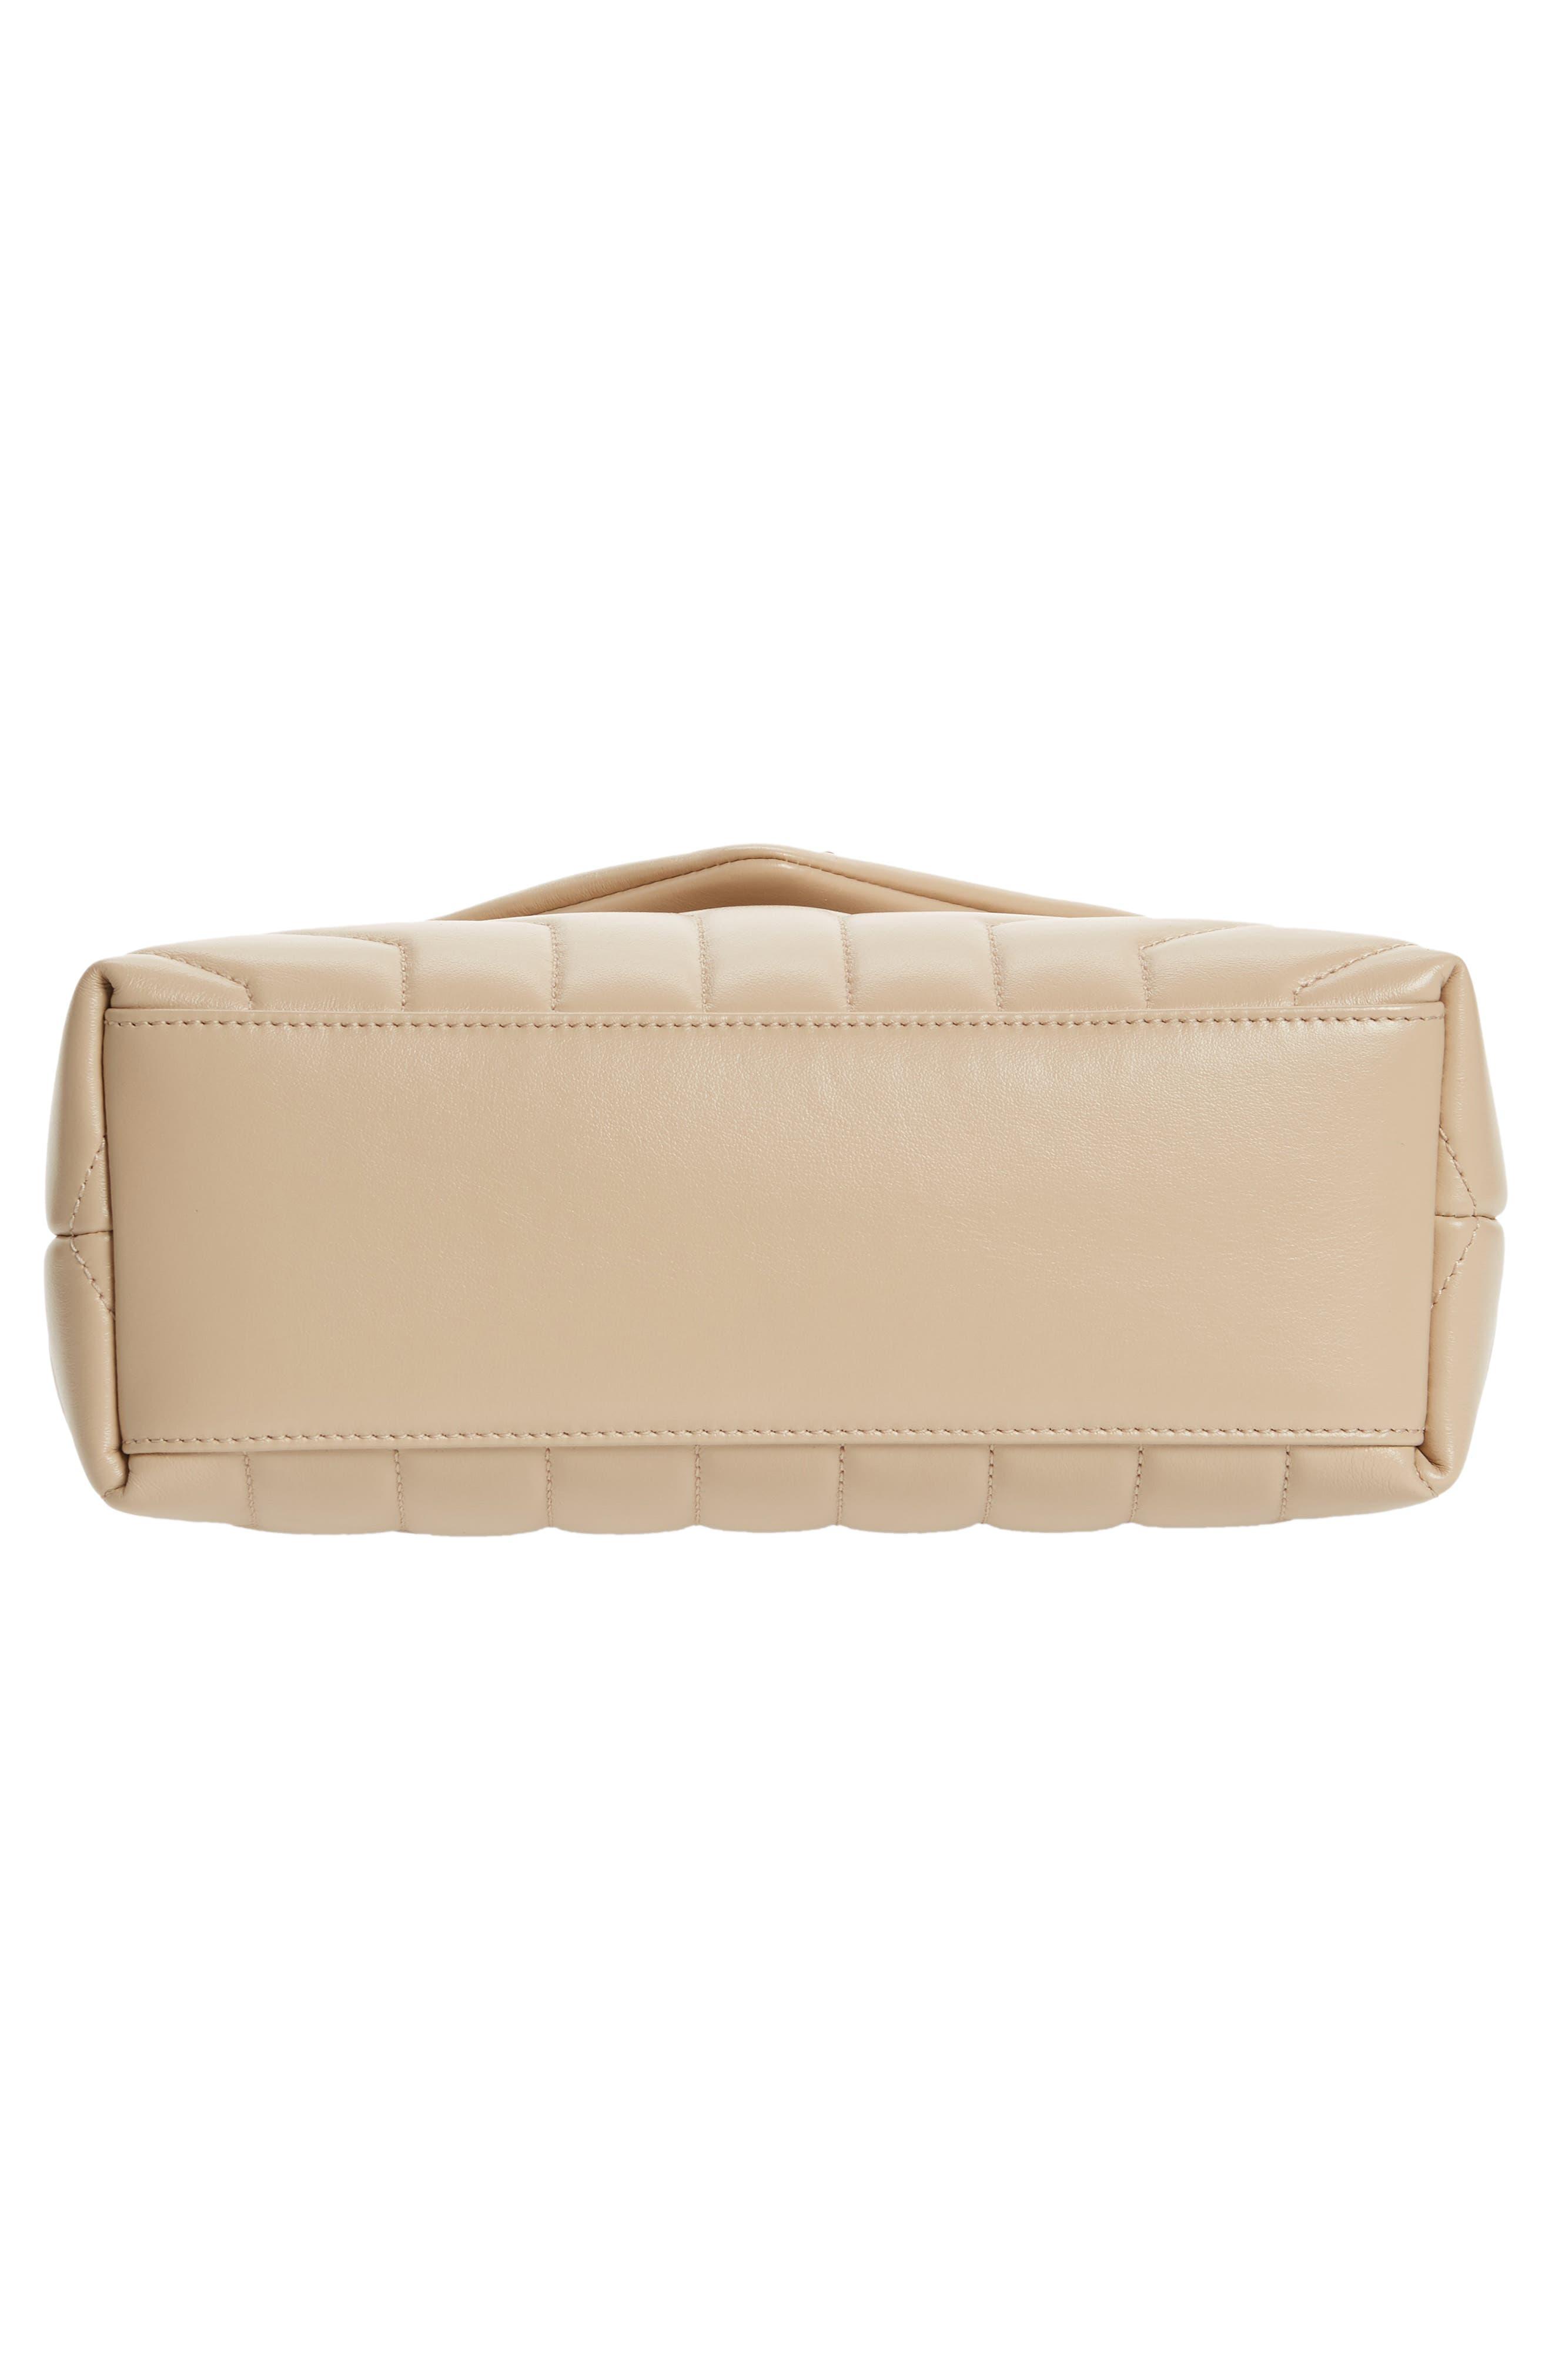 ,                             Small Loulou Leather Shoulder Bag,                             Alternate thumbnail 16, color,                             251